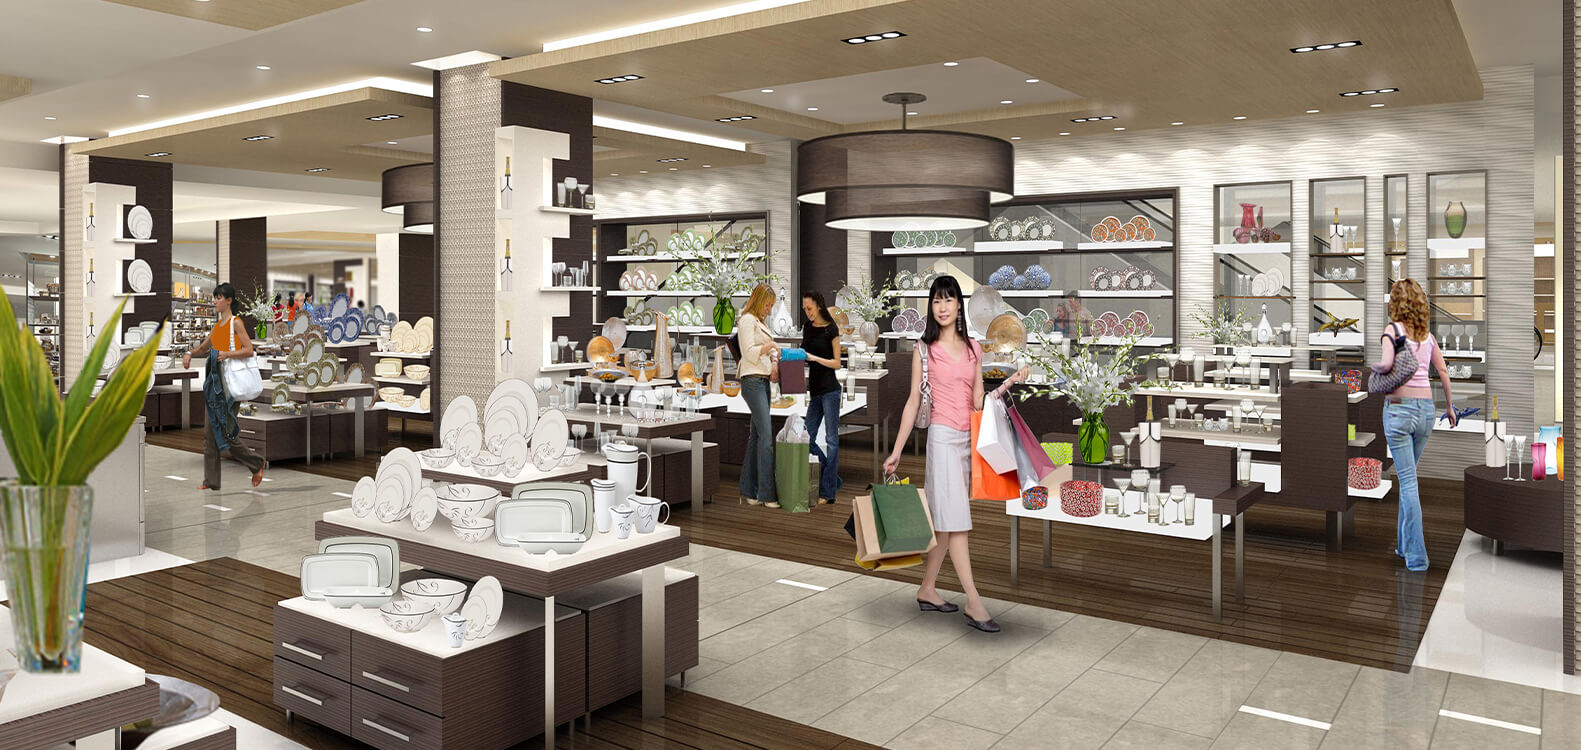 Hyundai Soul Mall Tableware, Corée du Sud